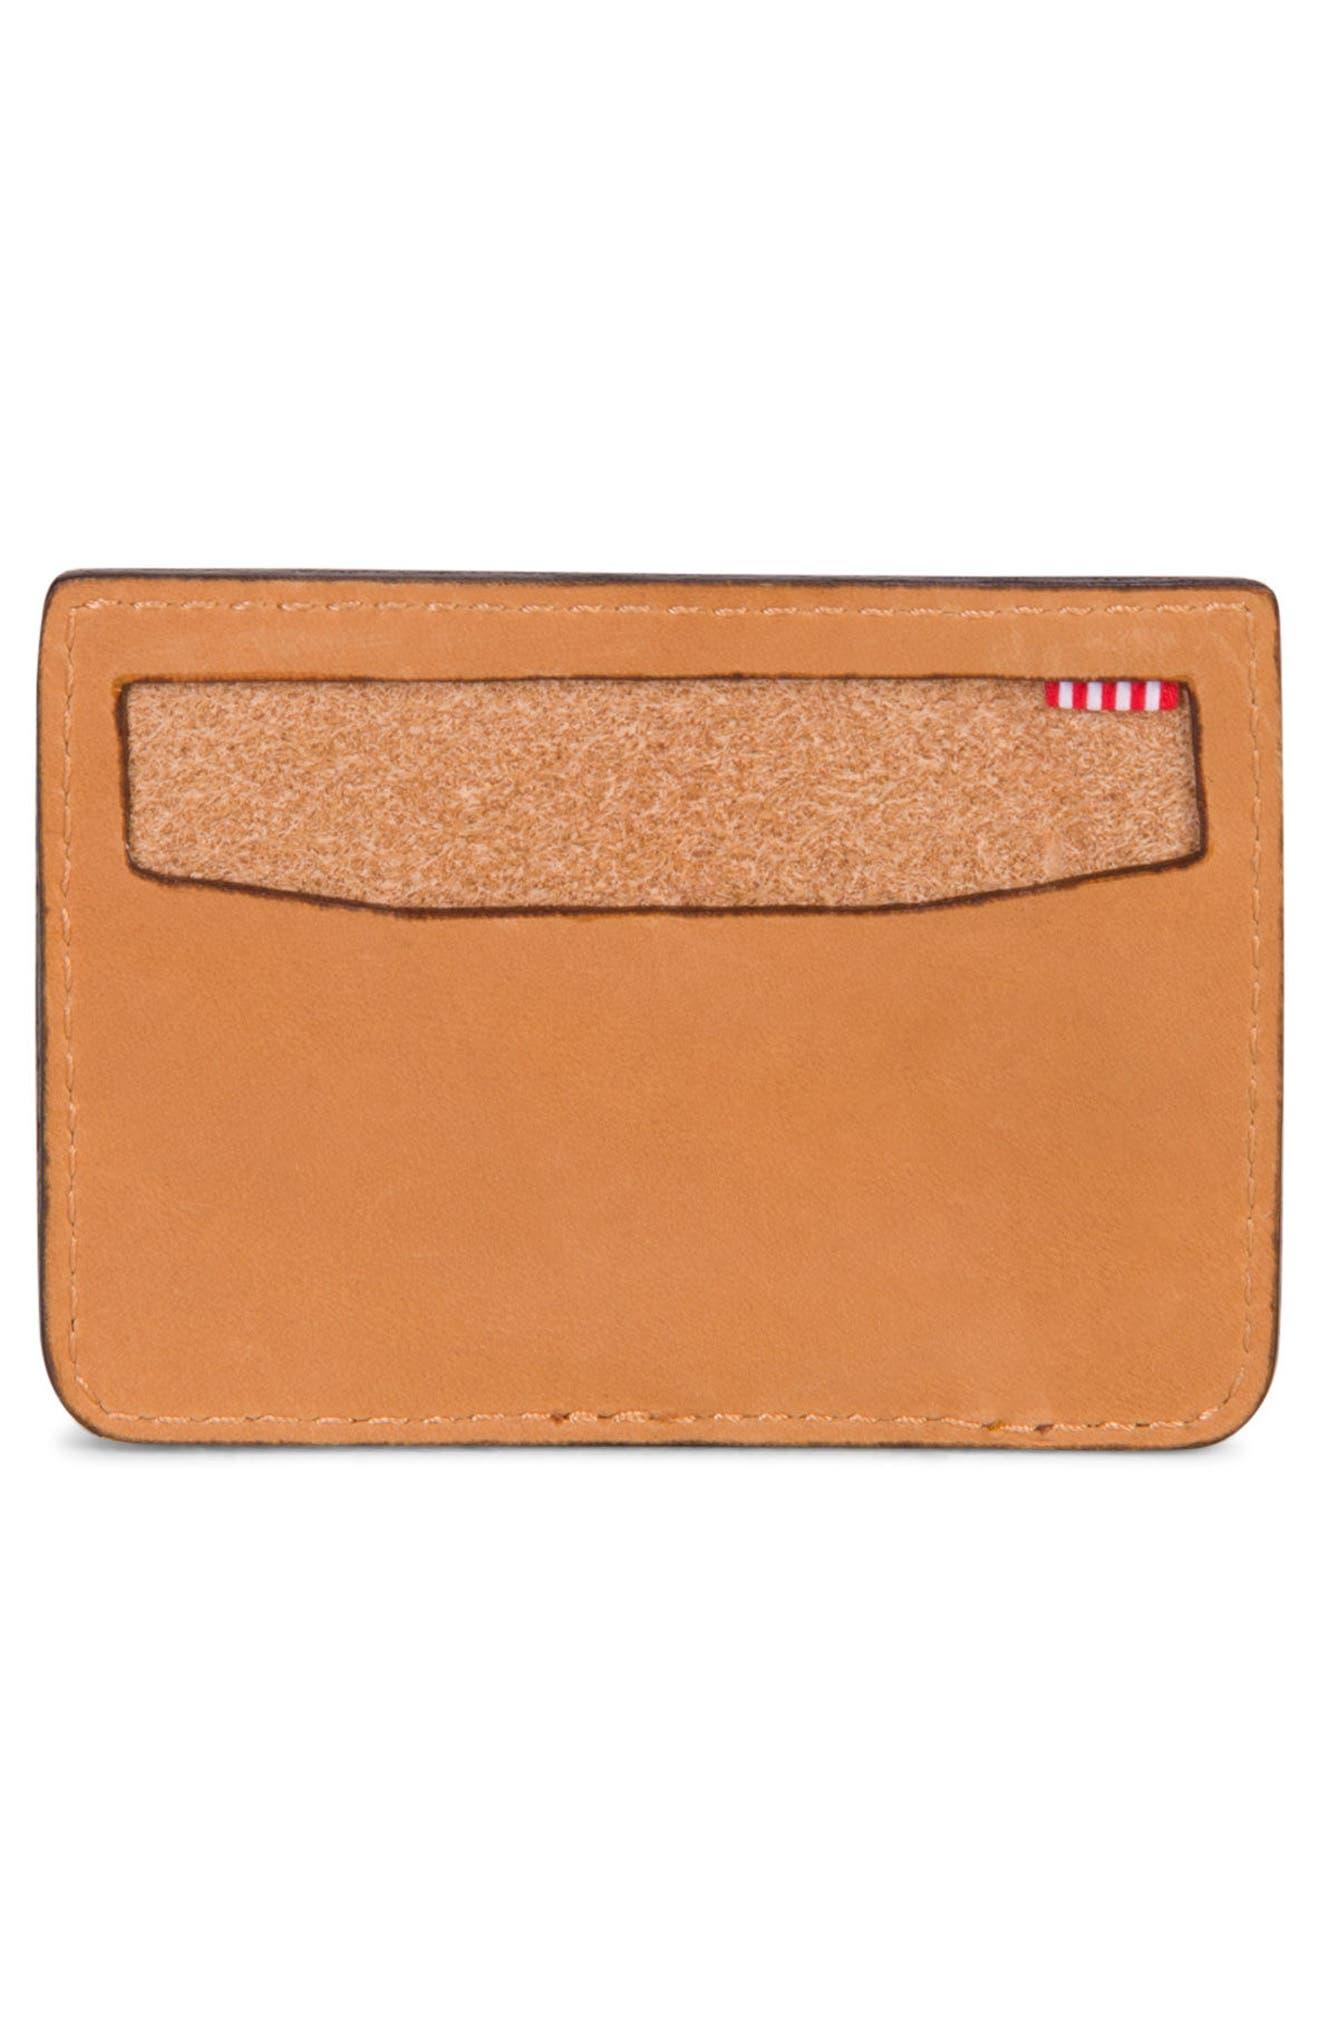 Ace Leather Card Case,                             Alternate thumbnail 3, color,                             Tan